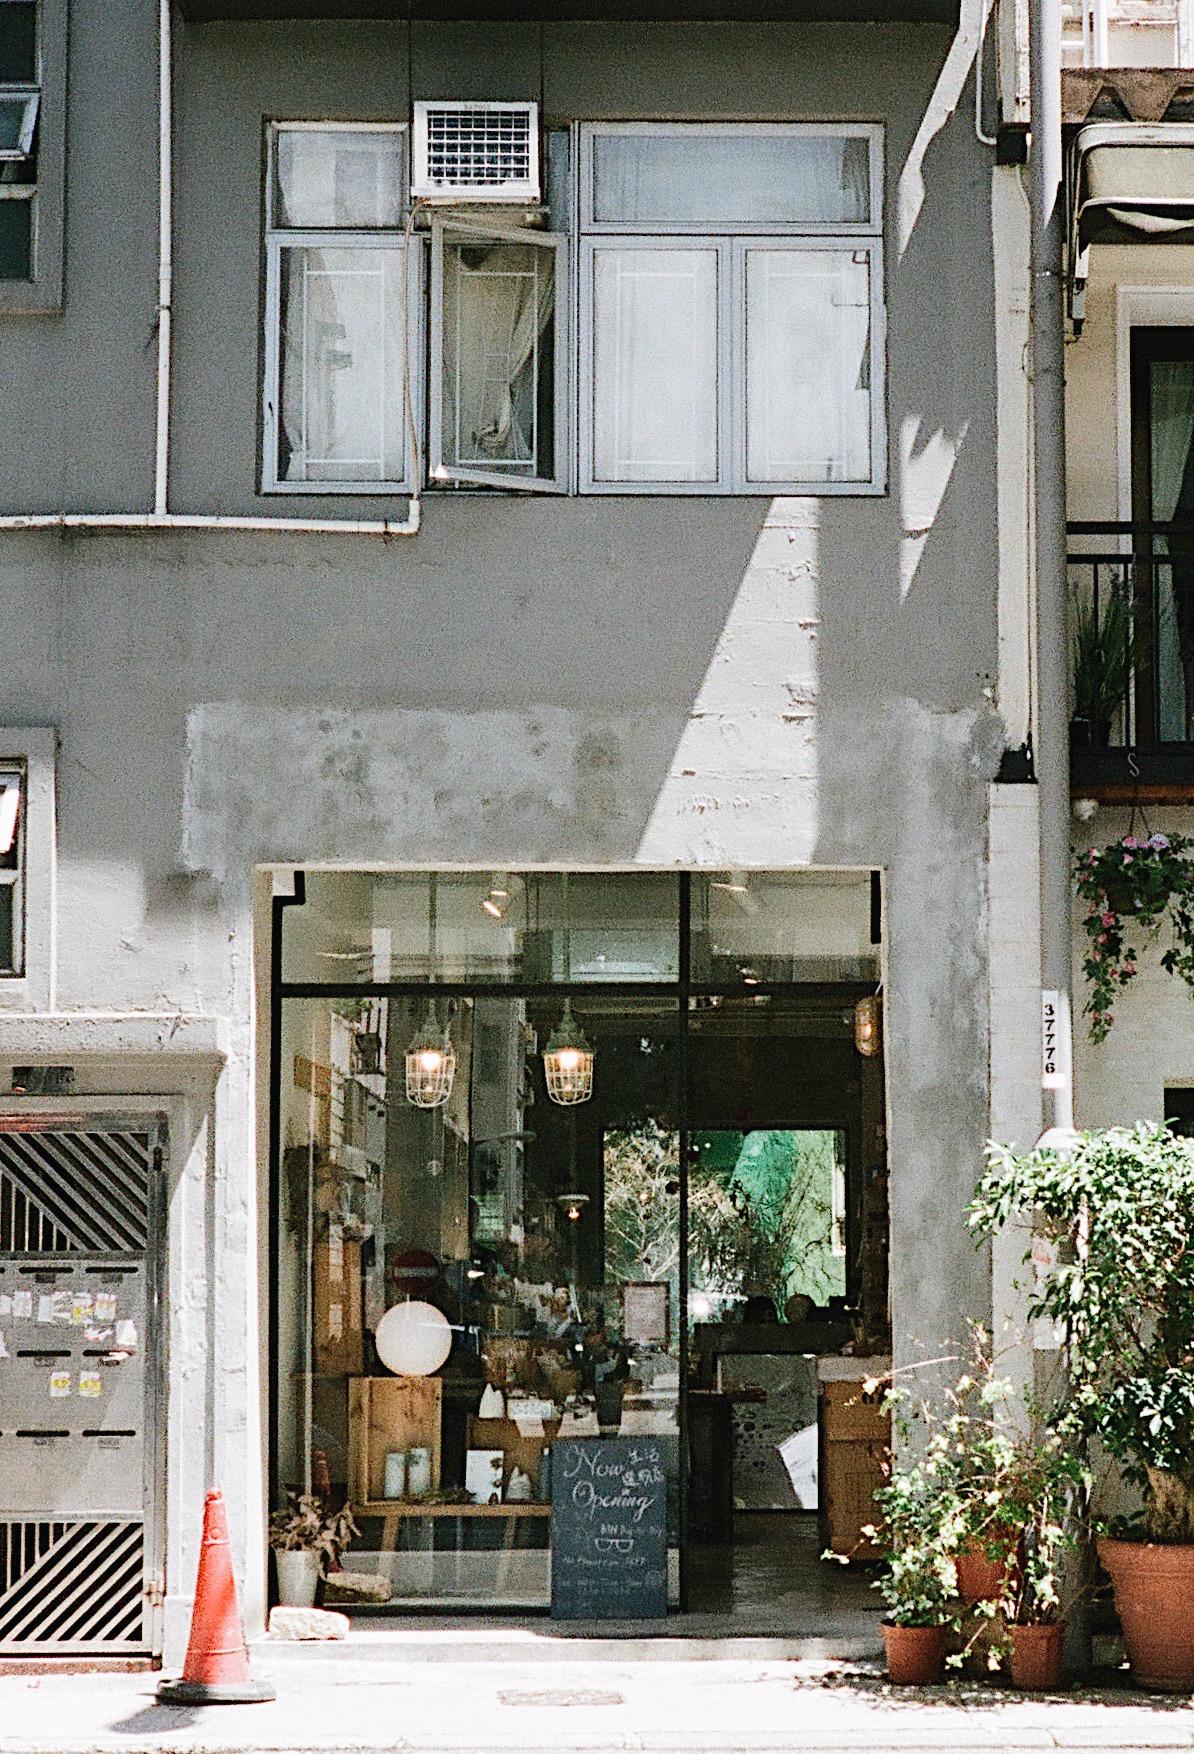 The Flower Room - by Pause Rewind & FastforwardShop 15A, Sun Chun Street, Tai Hang, Hong KongTue - Sun 12:30 - 20:30